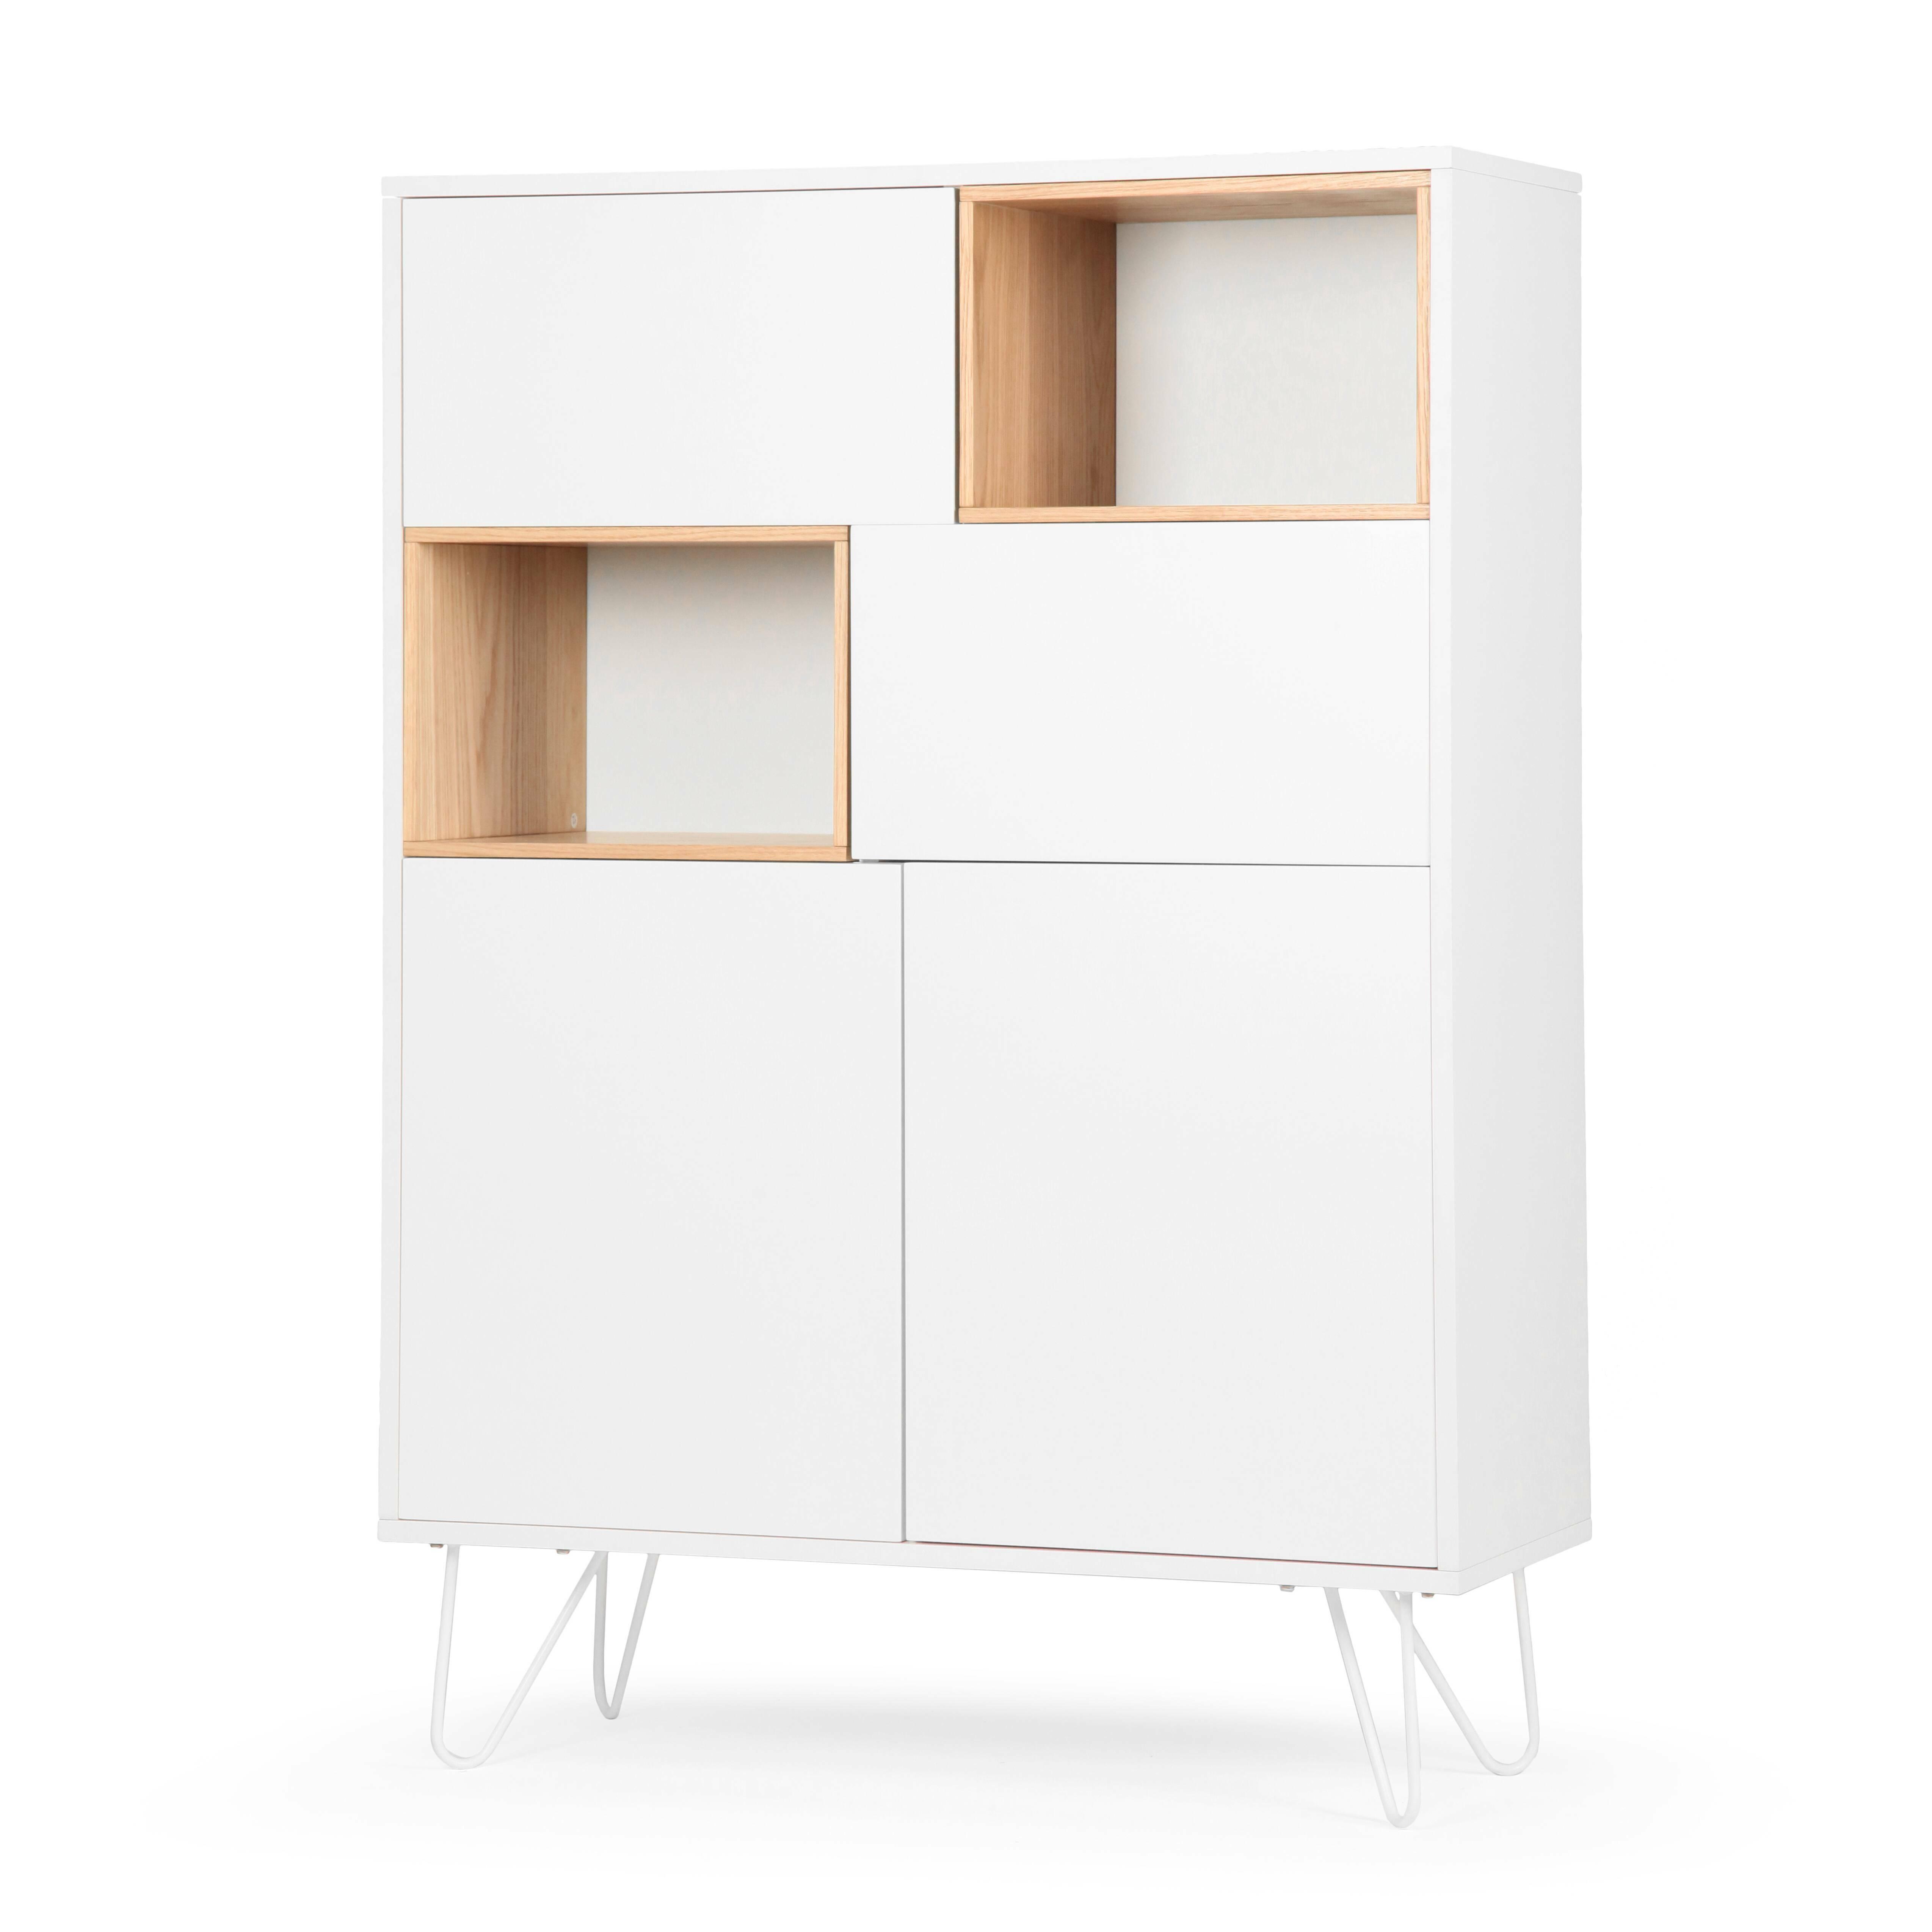 Книжный шкаф Stanmore книжный шкаф us keller